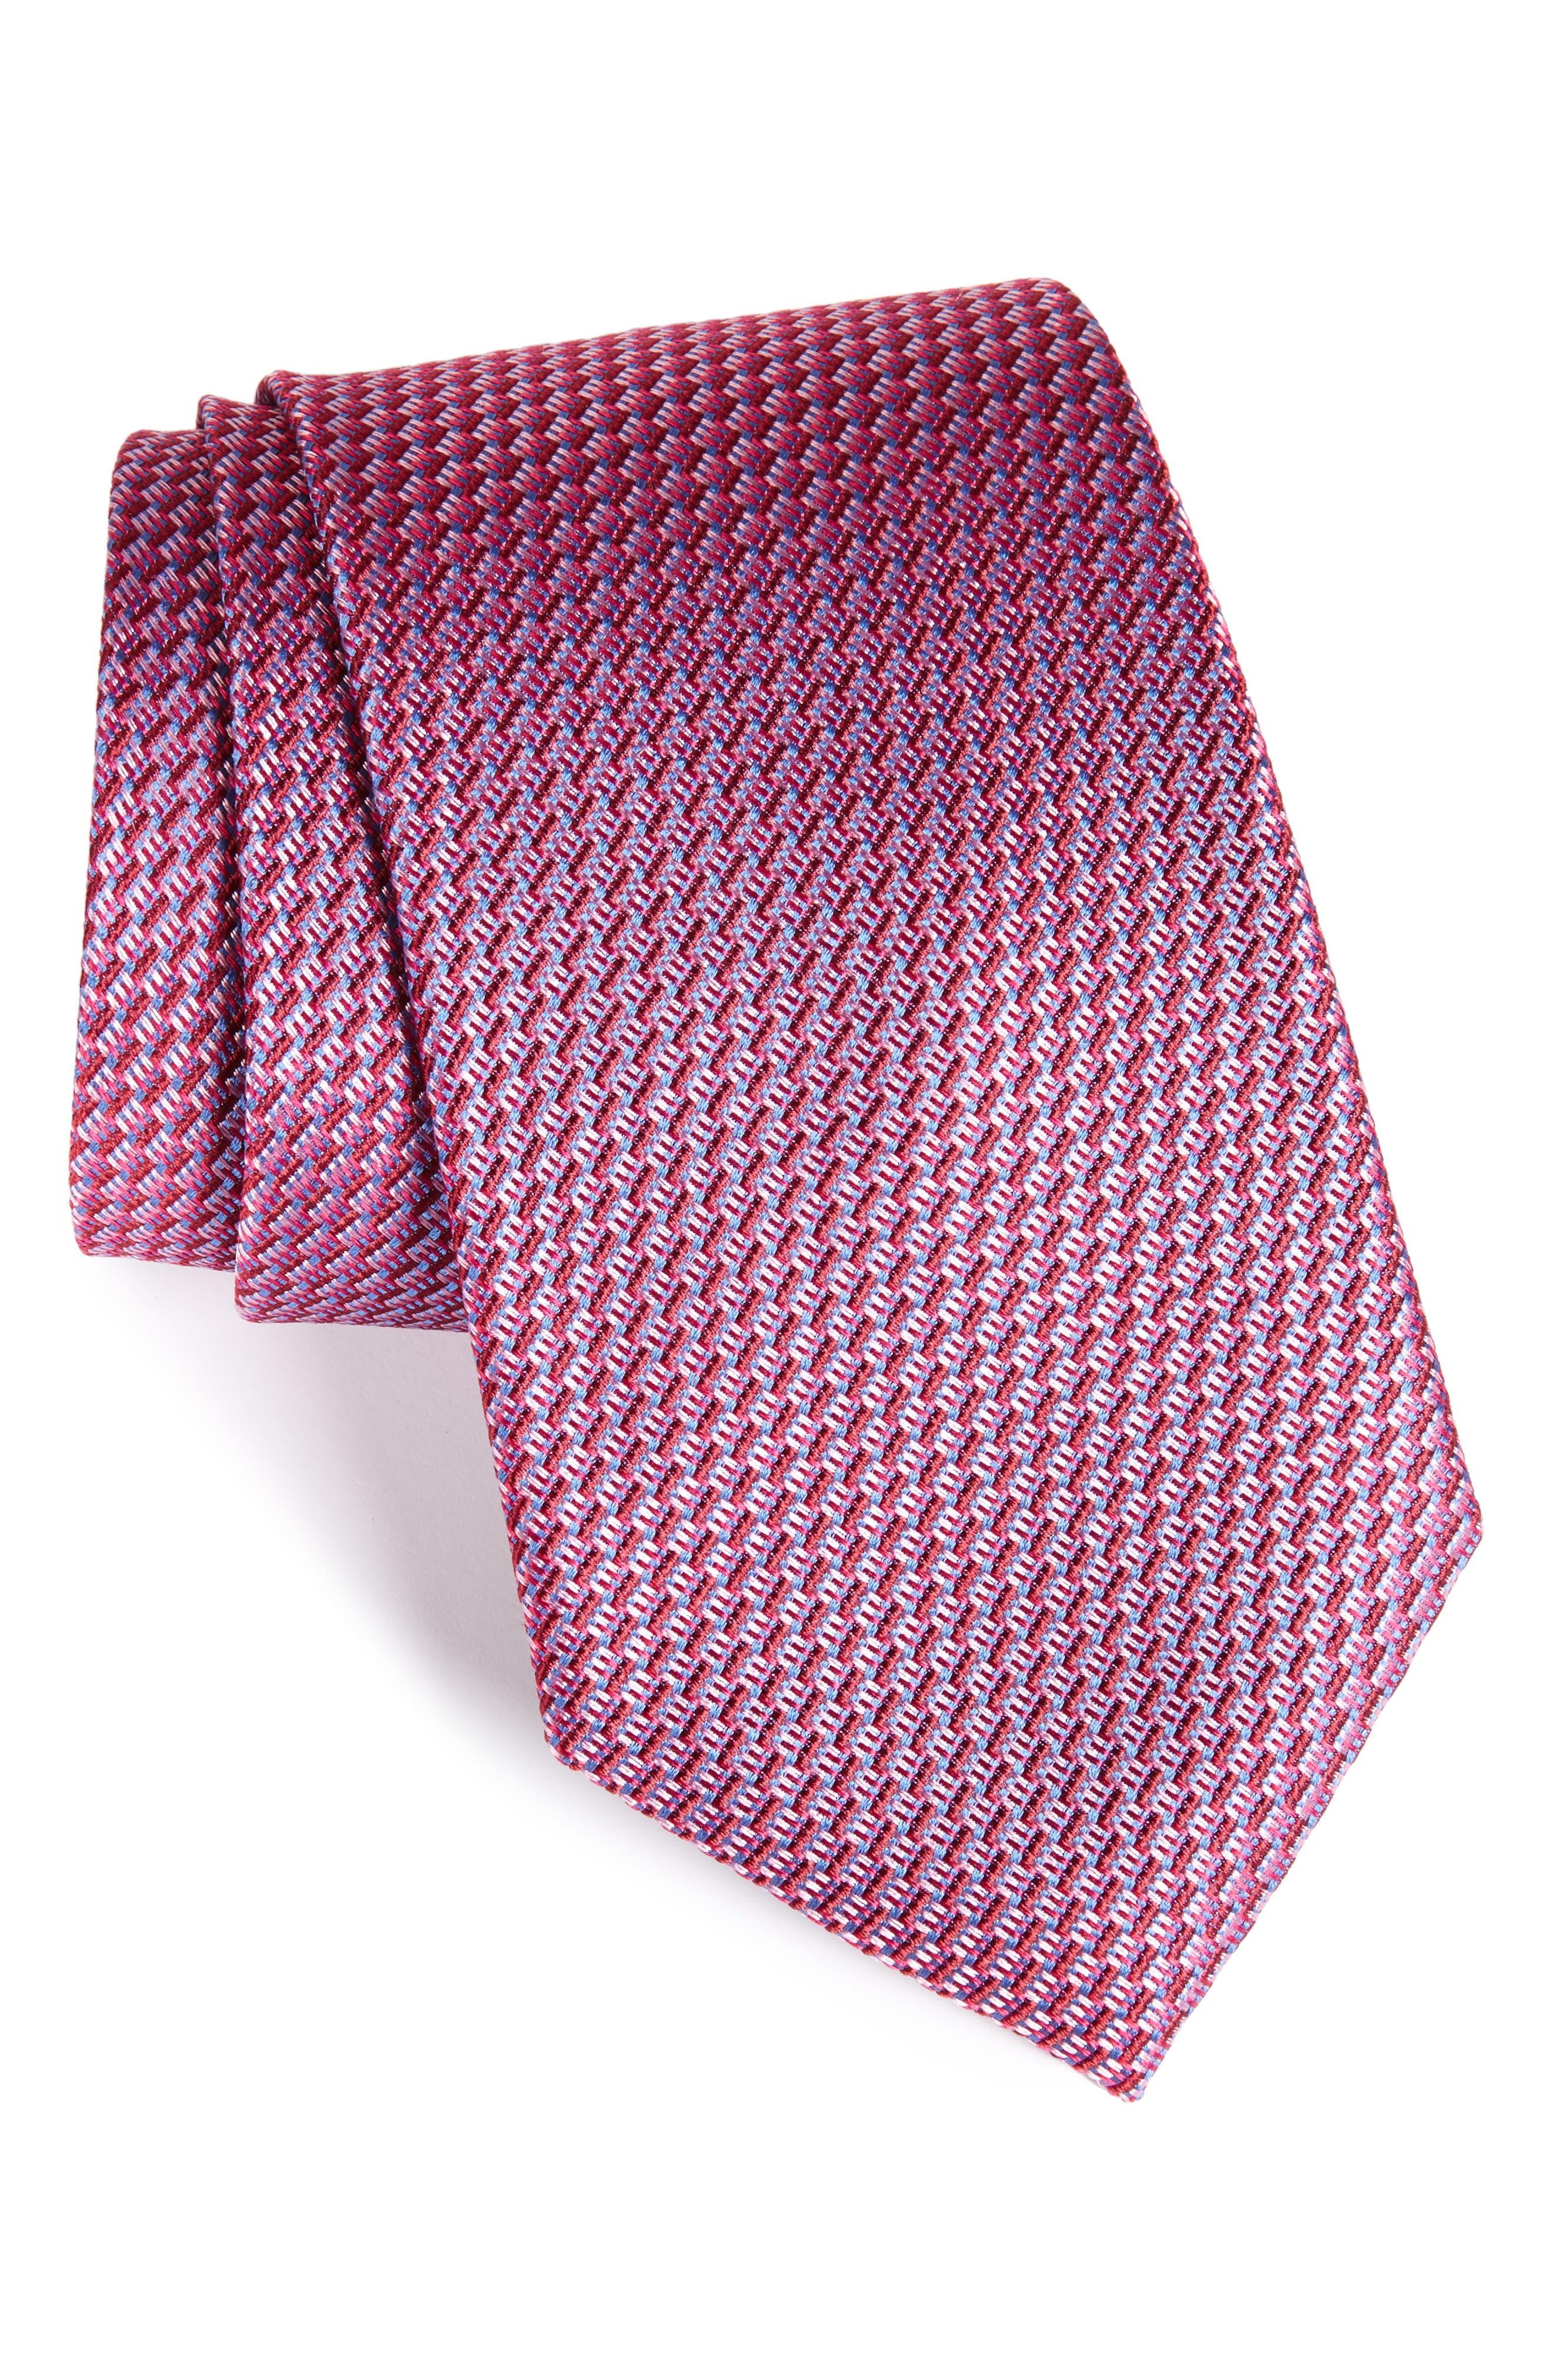 Alternate Image 1 Selected - Nordstrom Men's Shop Tech Woven Silk Tie (X-Long)